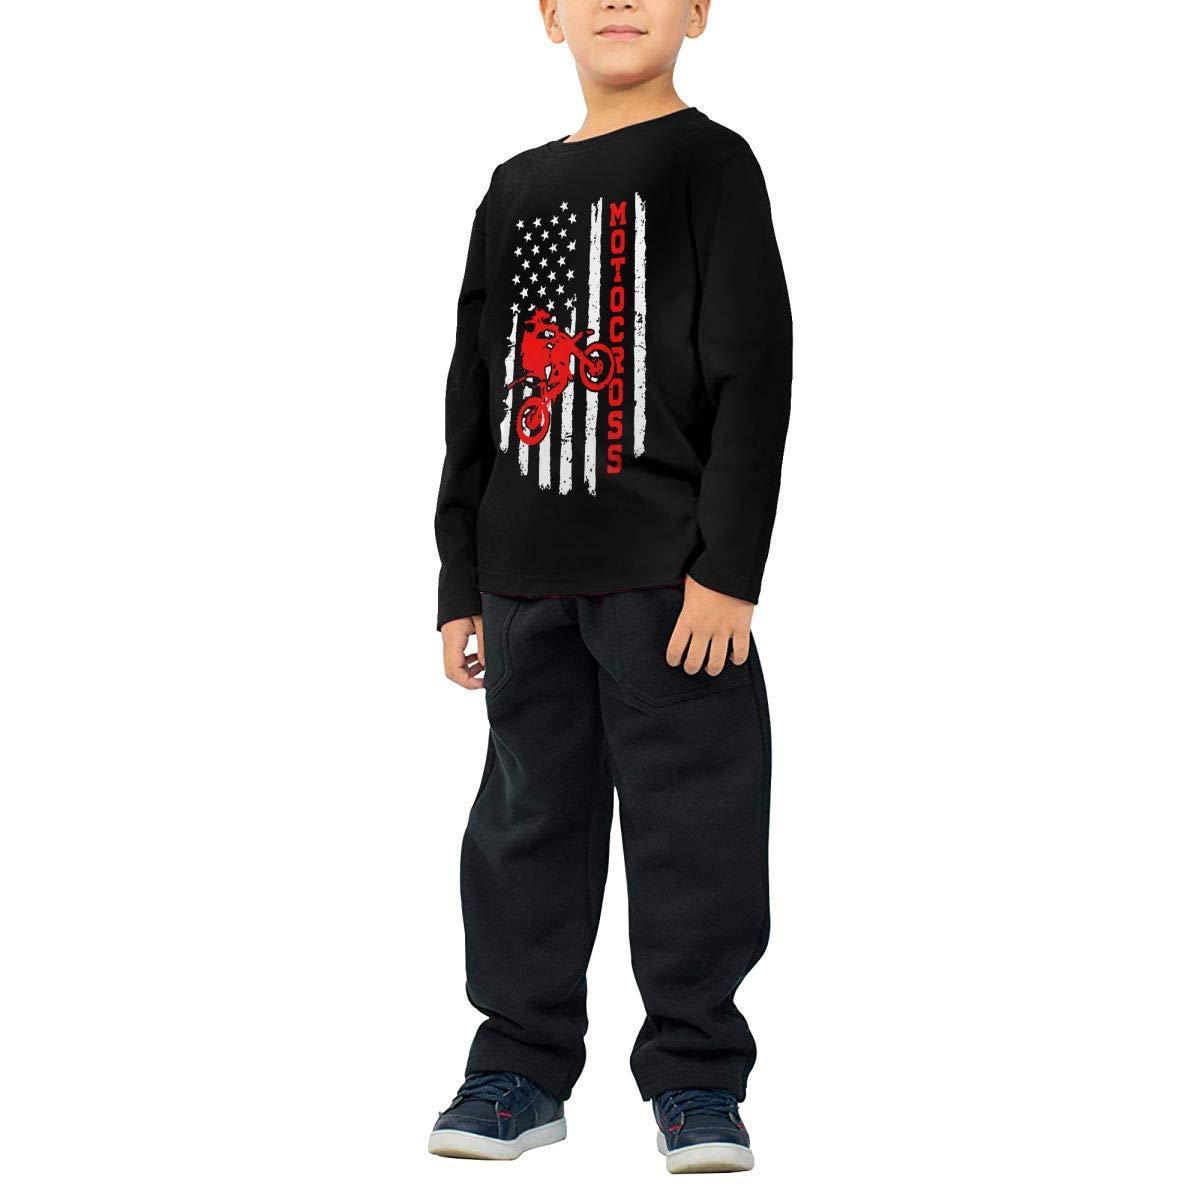 Fryhyu8 Baby Girls Childrens American Flag Motocross Dirt Bike Printed Long Sleeve 100/% Cotton Infants T-Shirts